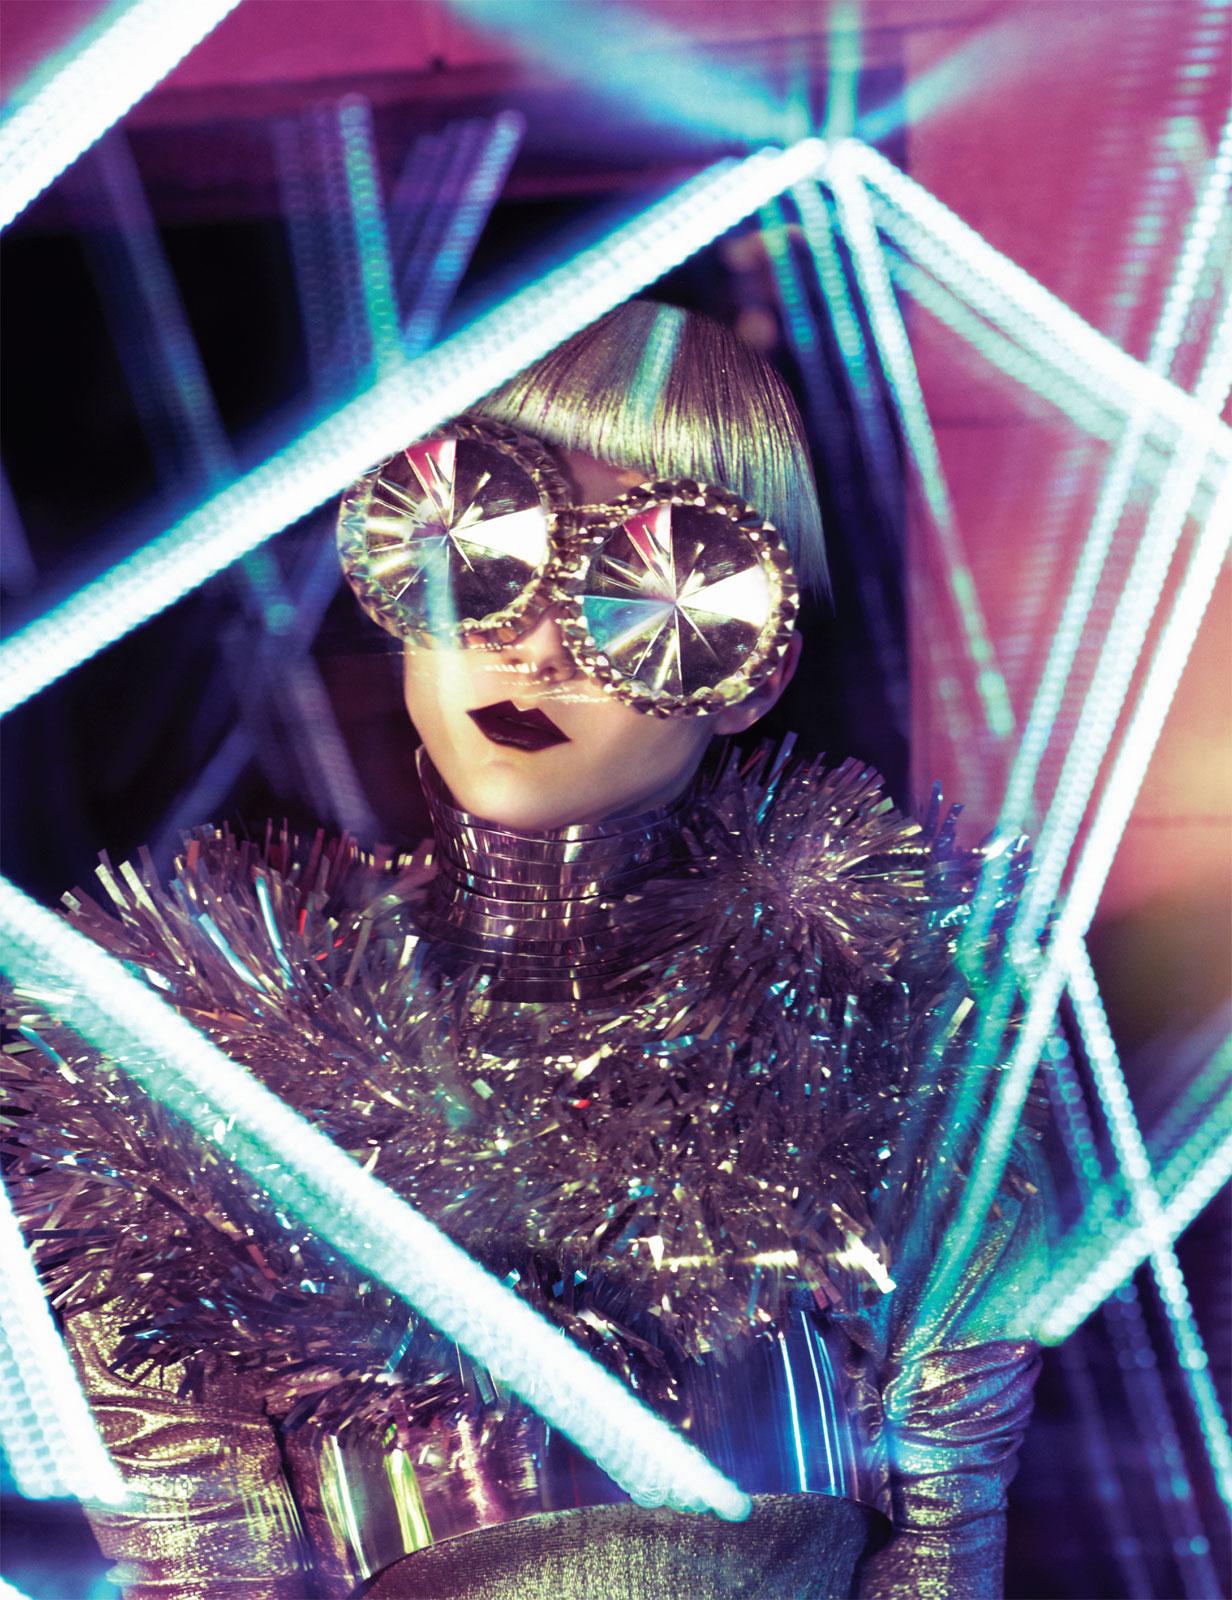 Weltraumoper por Elizaveta Porodina en Vice Magazine 2012